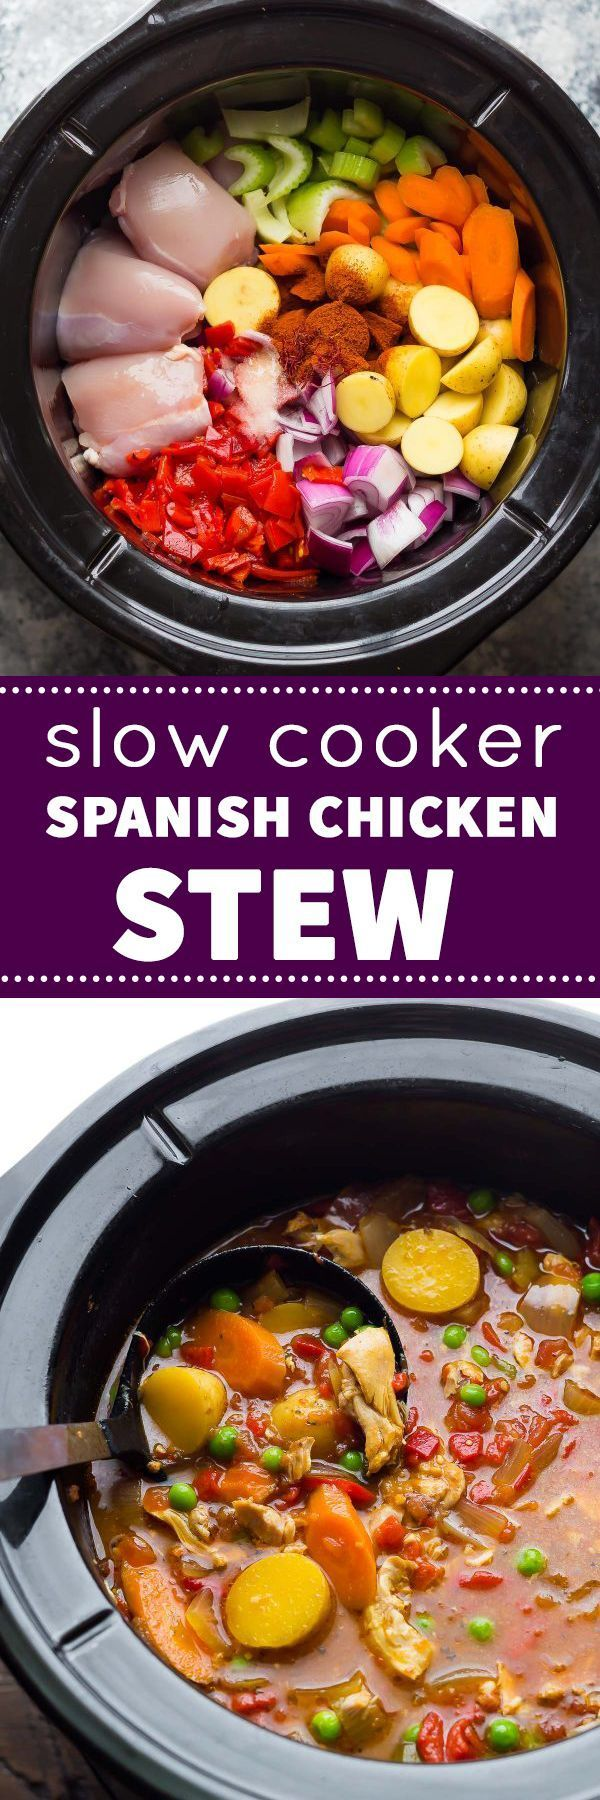 Food recipe food recipe in spanish language food recipe in spanish language pictures forumfinder Gallery